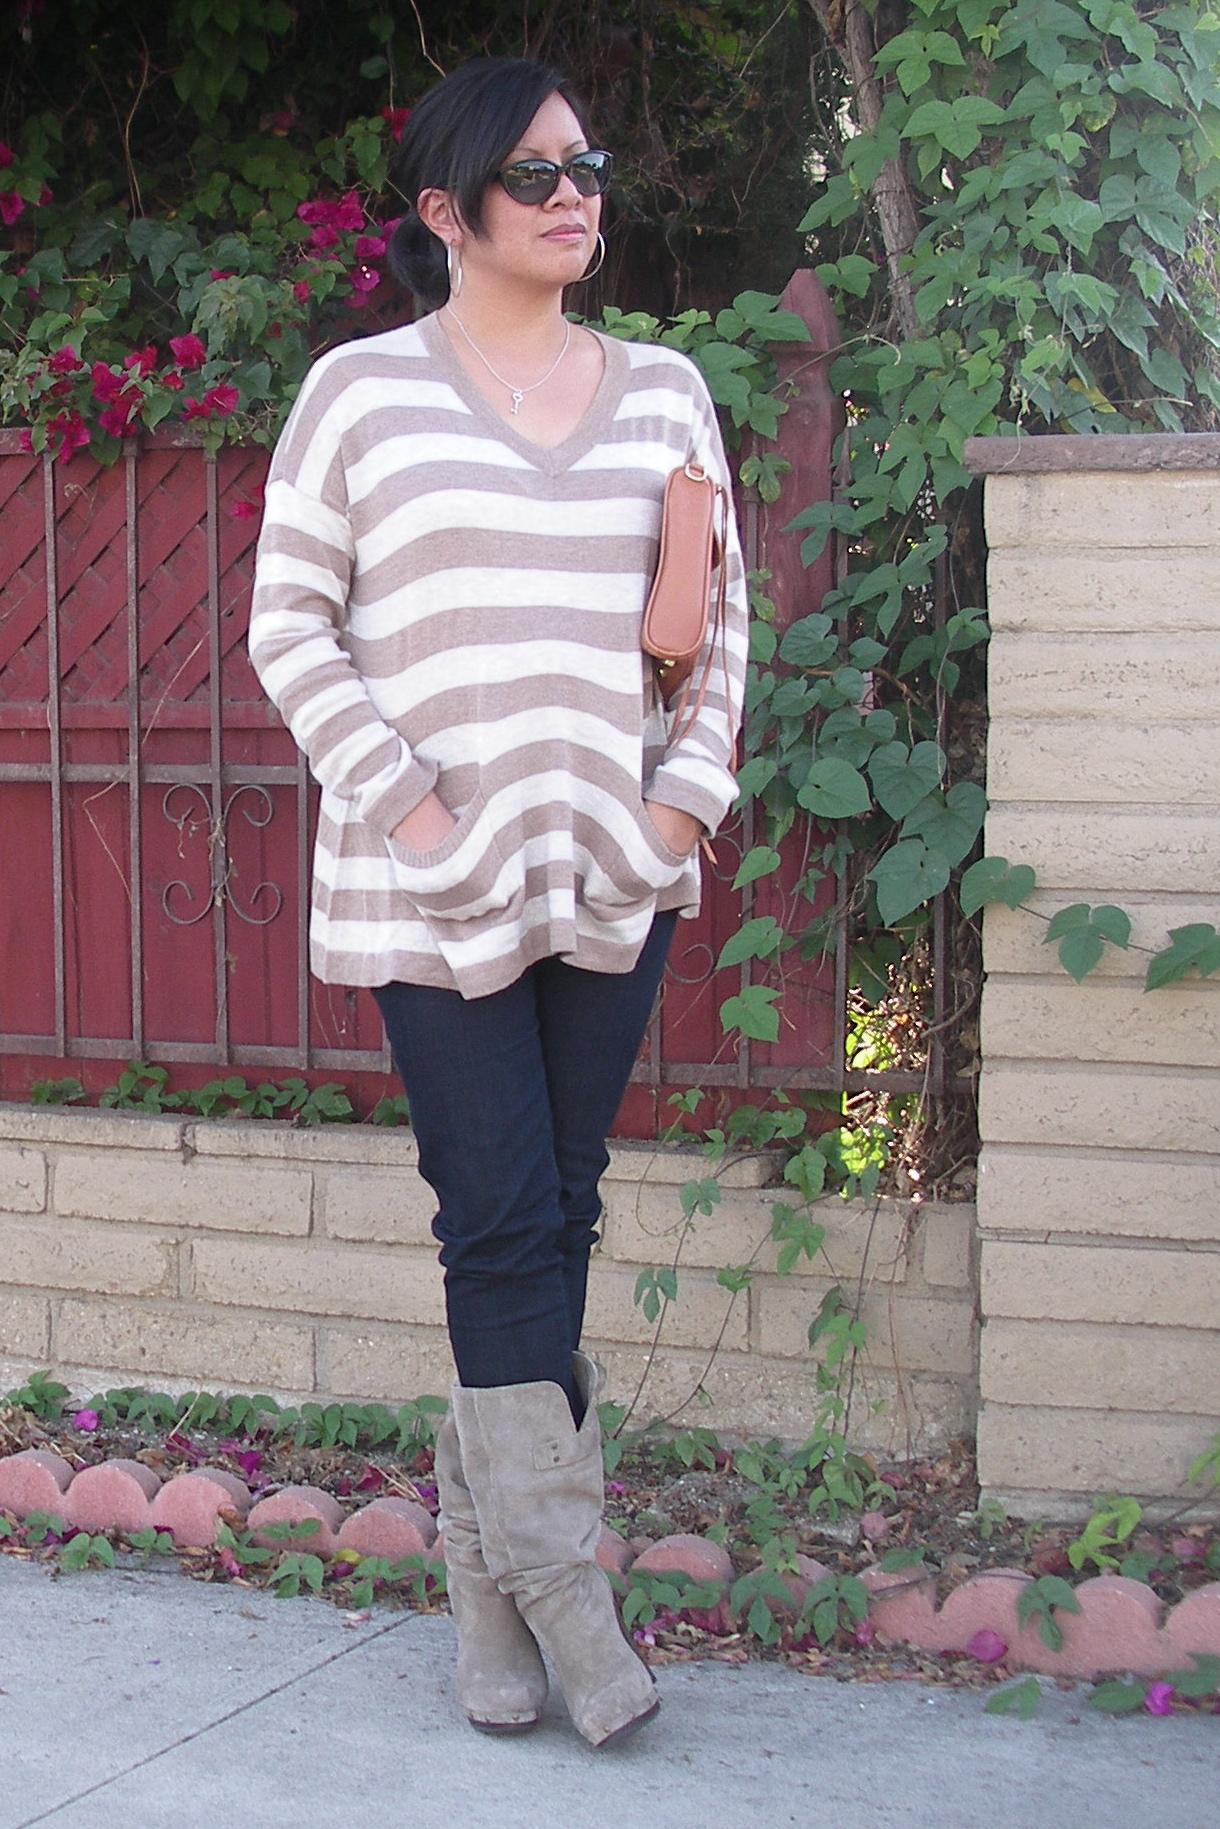 860fb6611 Outfit – Linda Matthews sweater  Steve Madden Luxe boots  Fossil denim  leggings  Rebecca Minkoff MAC purse  Coach sunnies